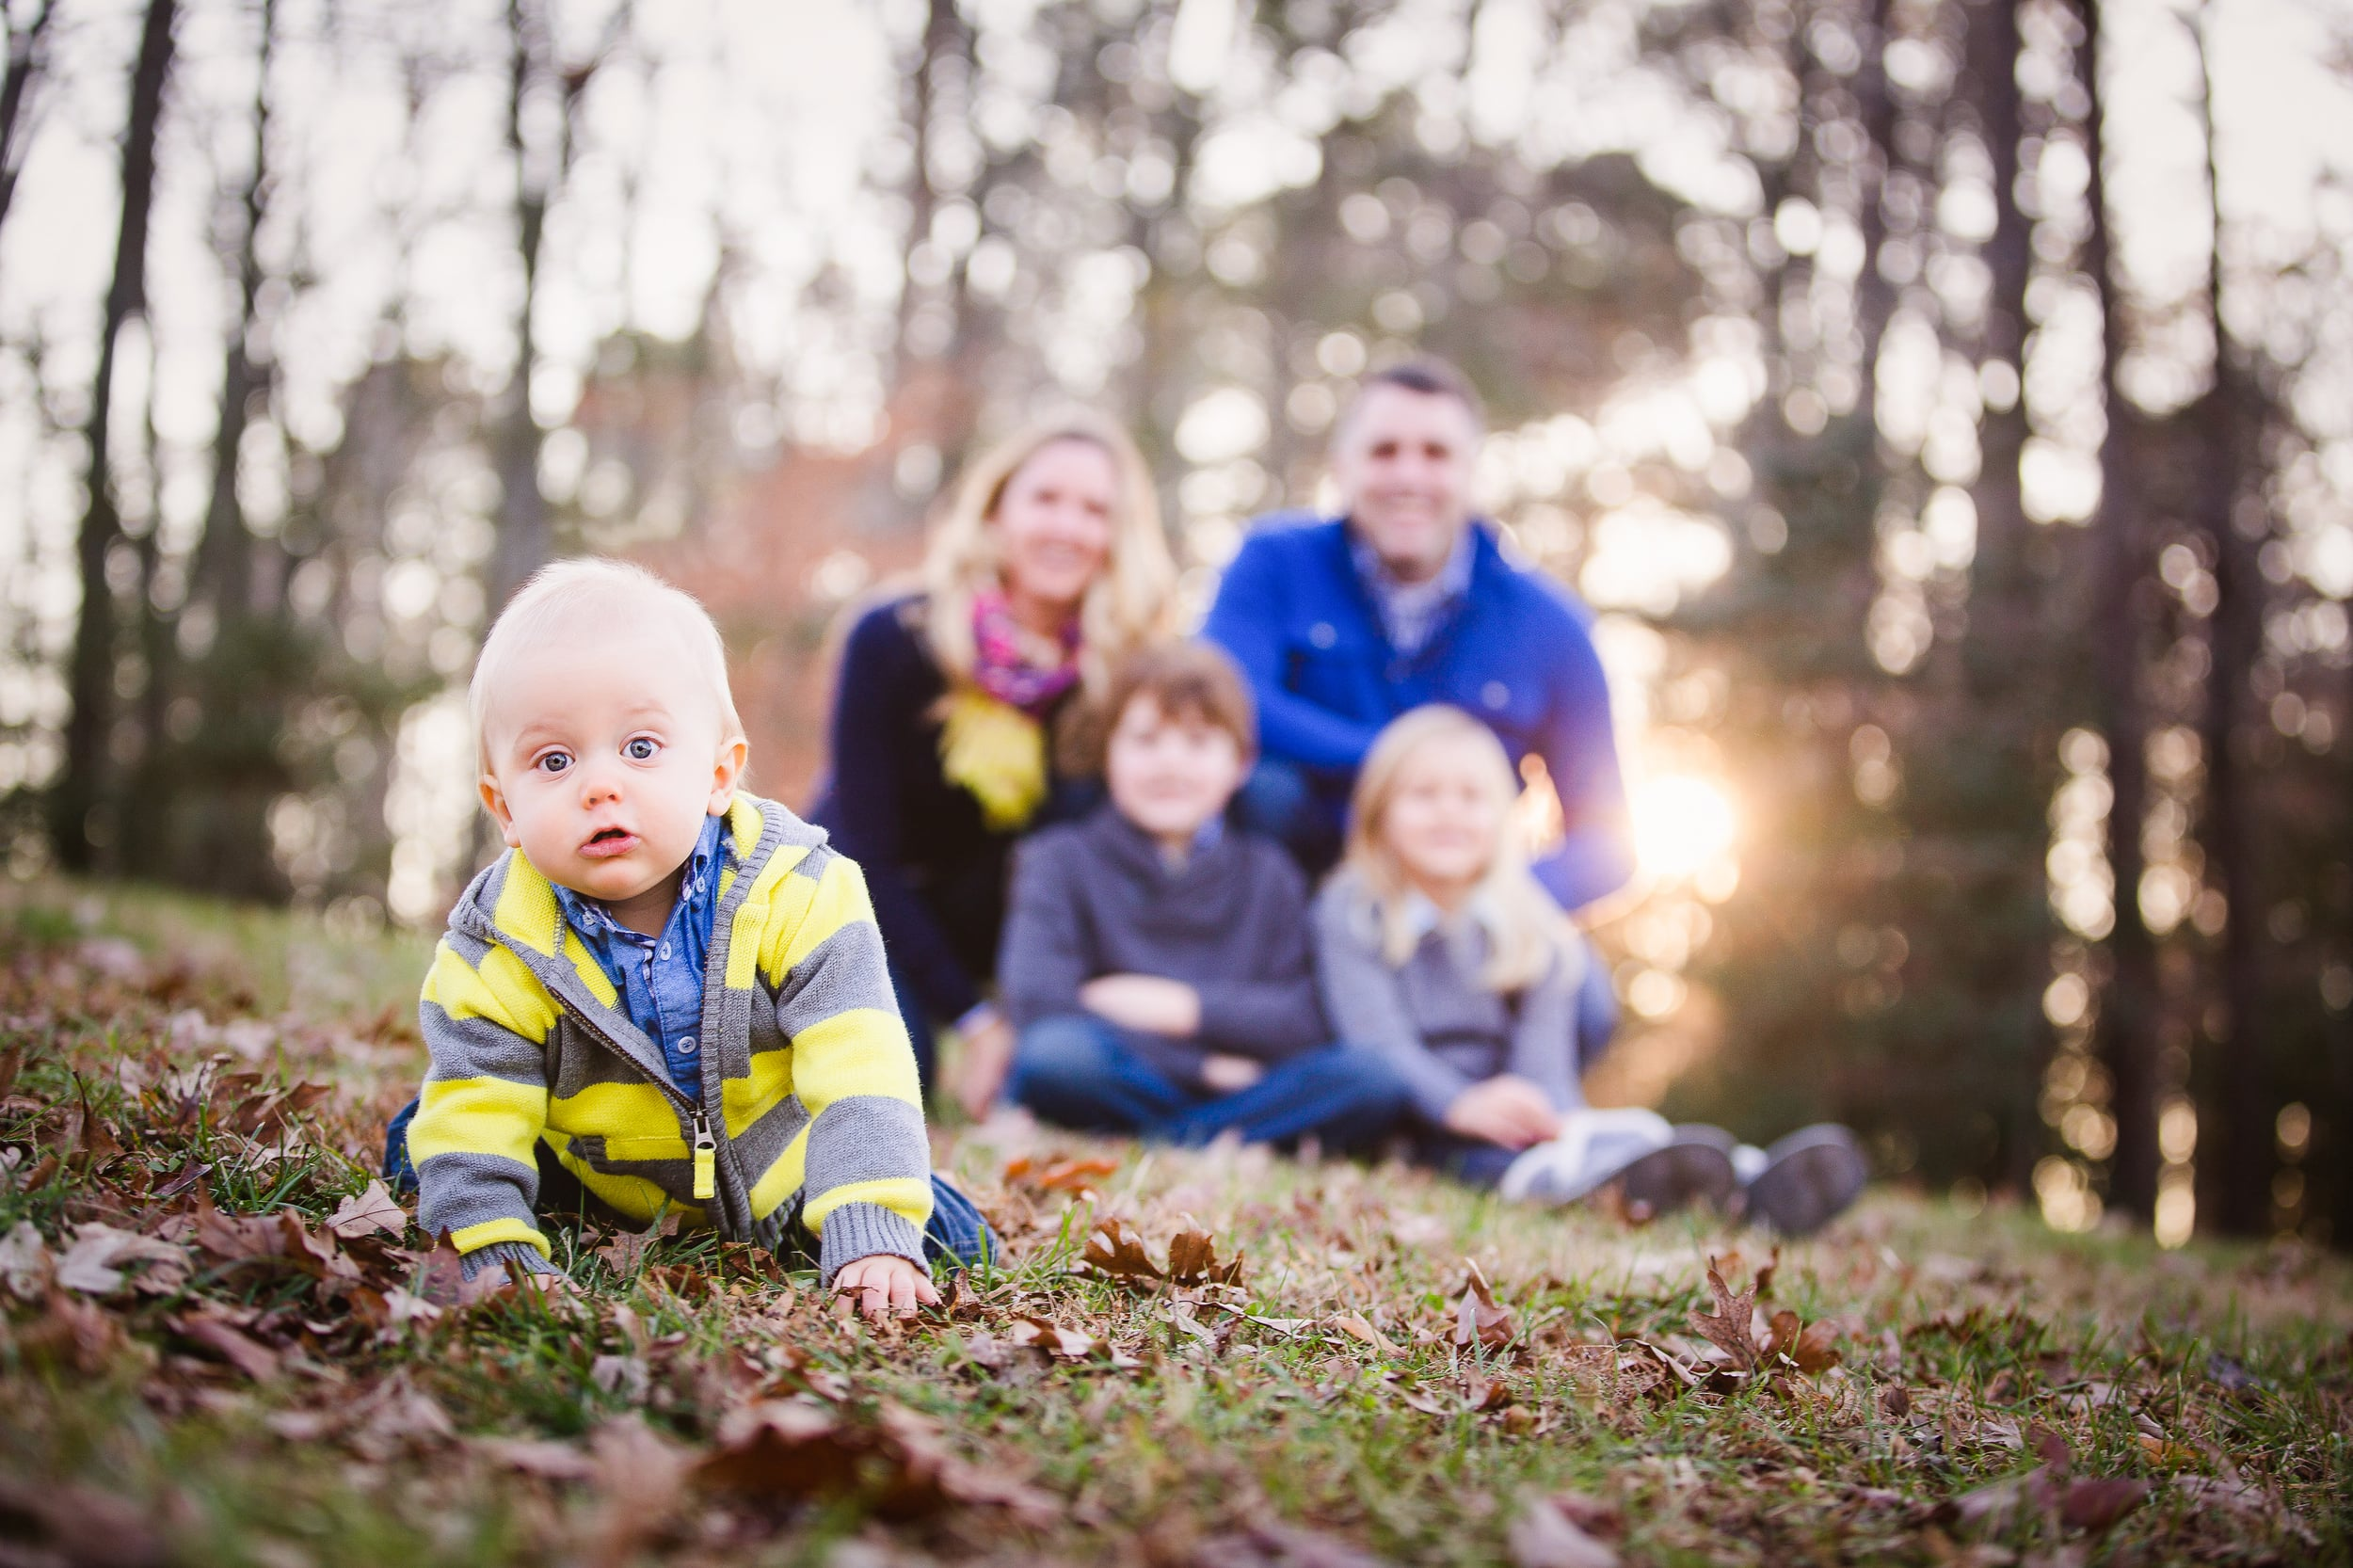 Radgowski-FamilyportraitsatSundayParkinMidlothianVA-SarahKanePhotography061.jpg